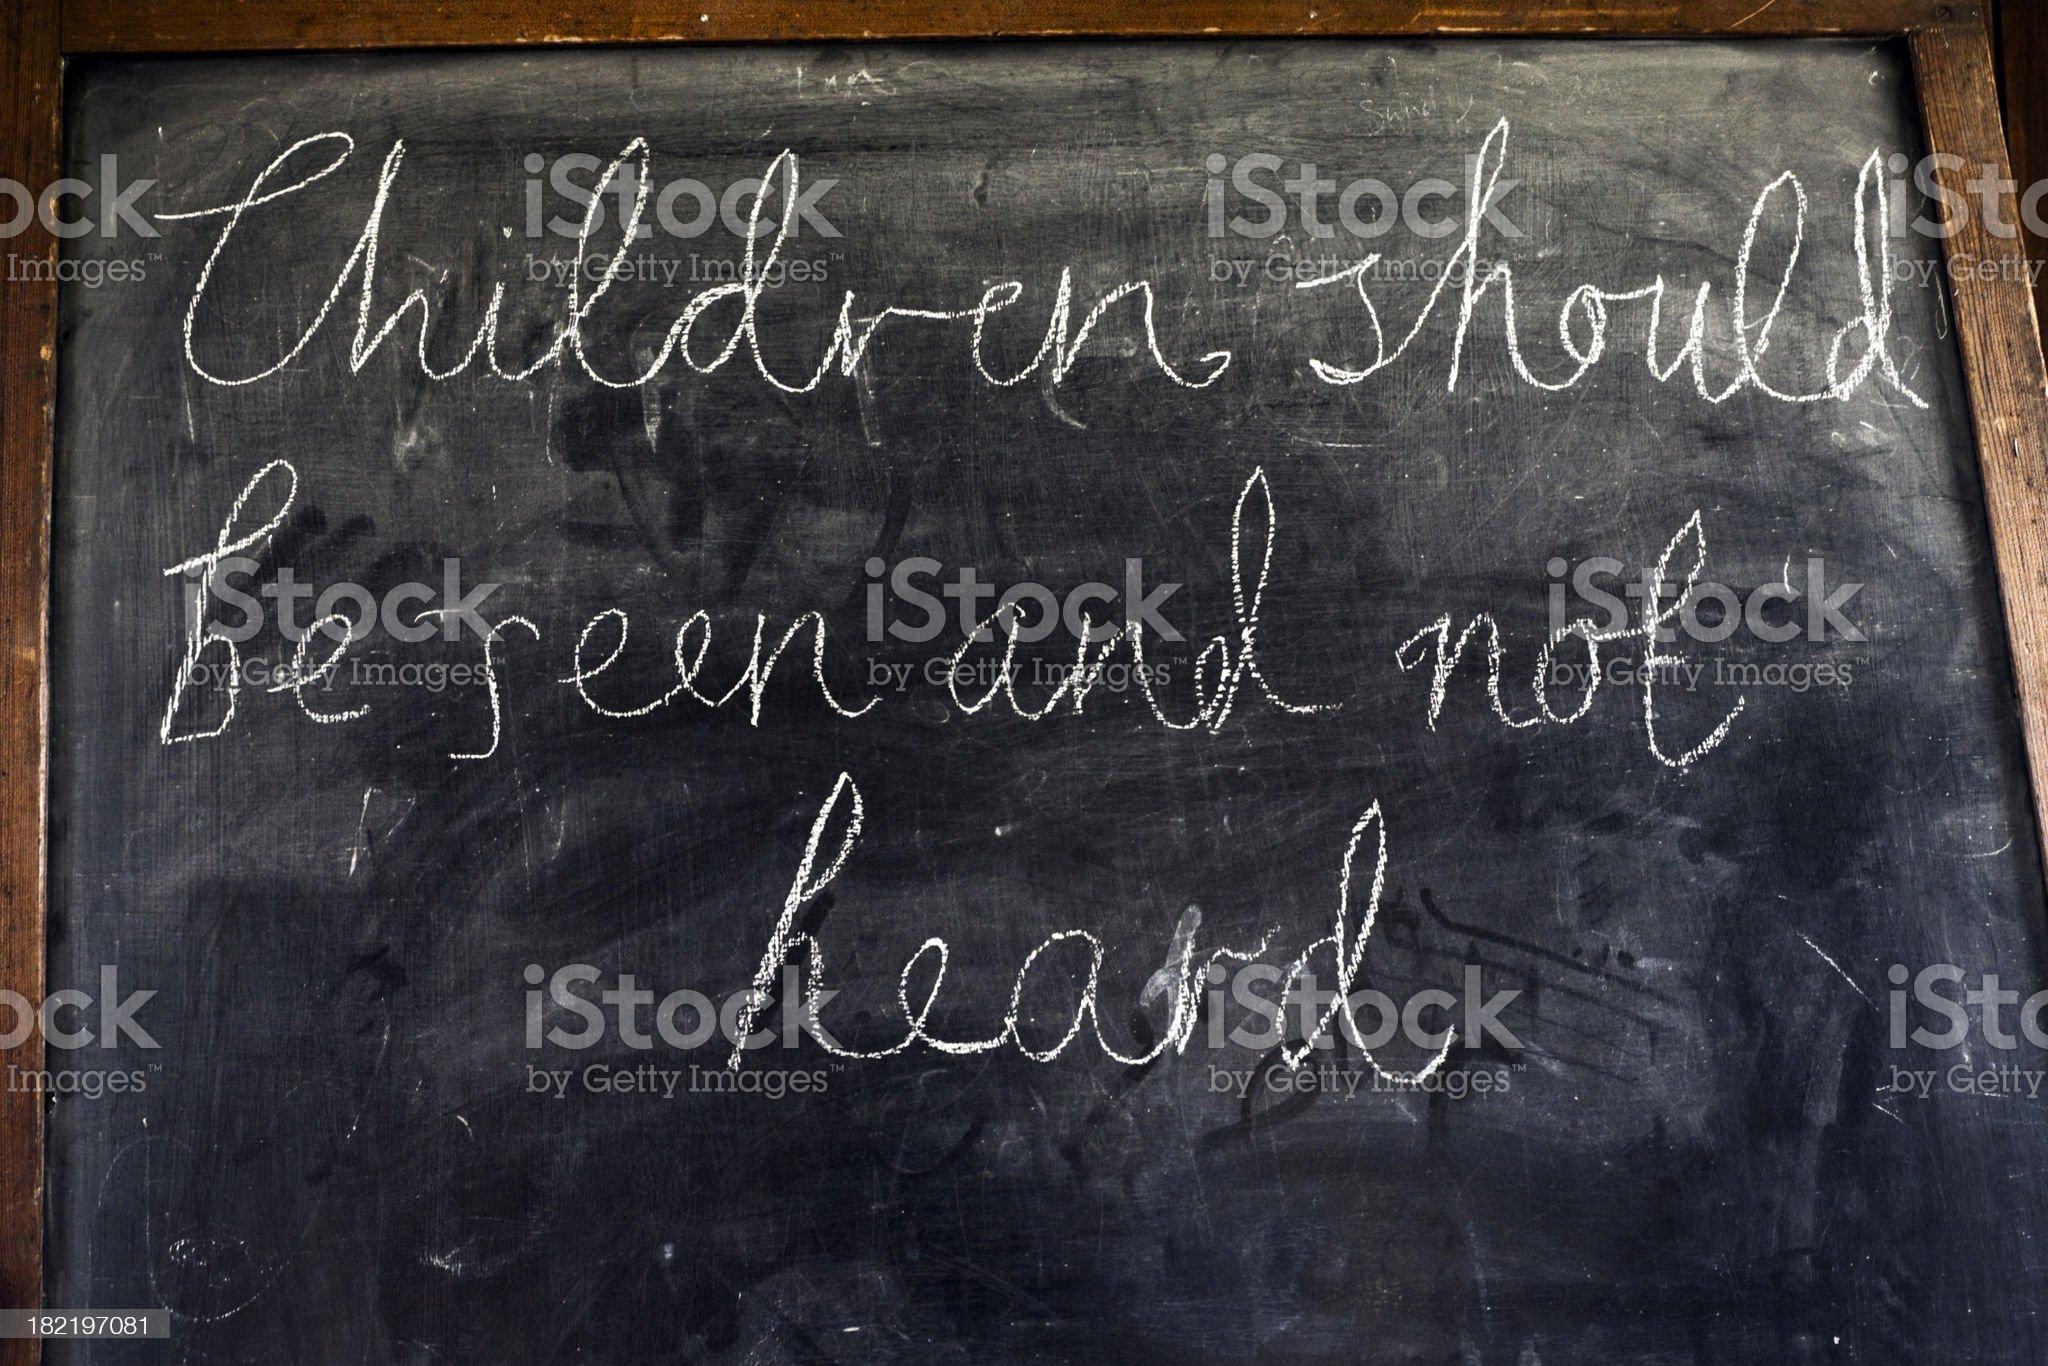 Children should be seen and not heard (blackboard inscription) royalty-free stock photo